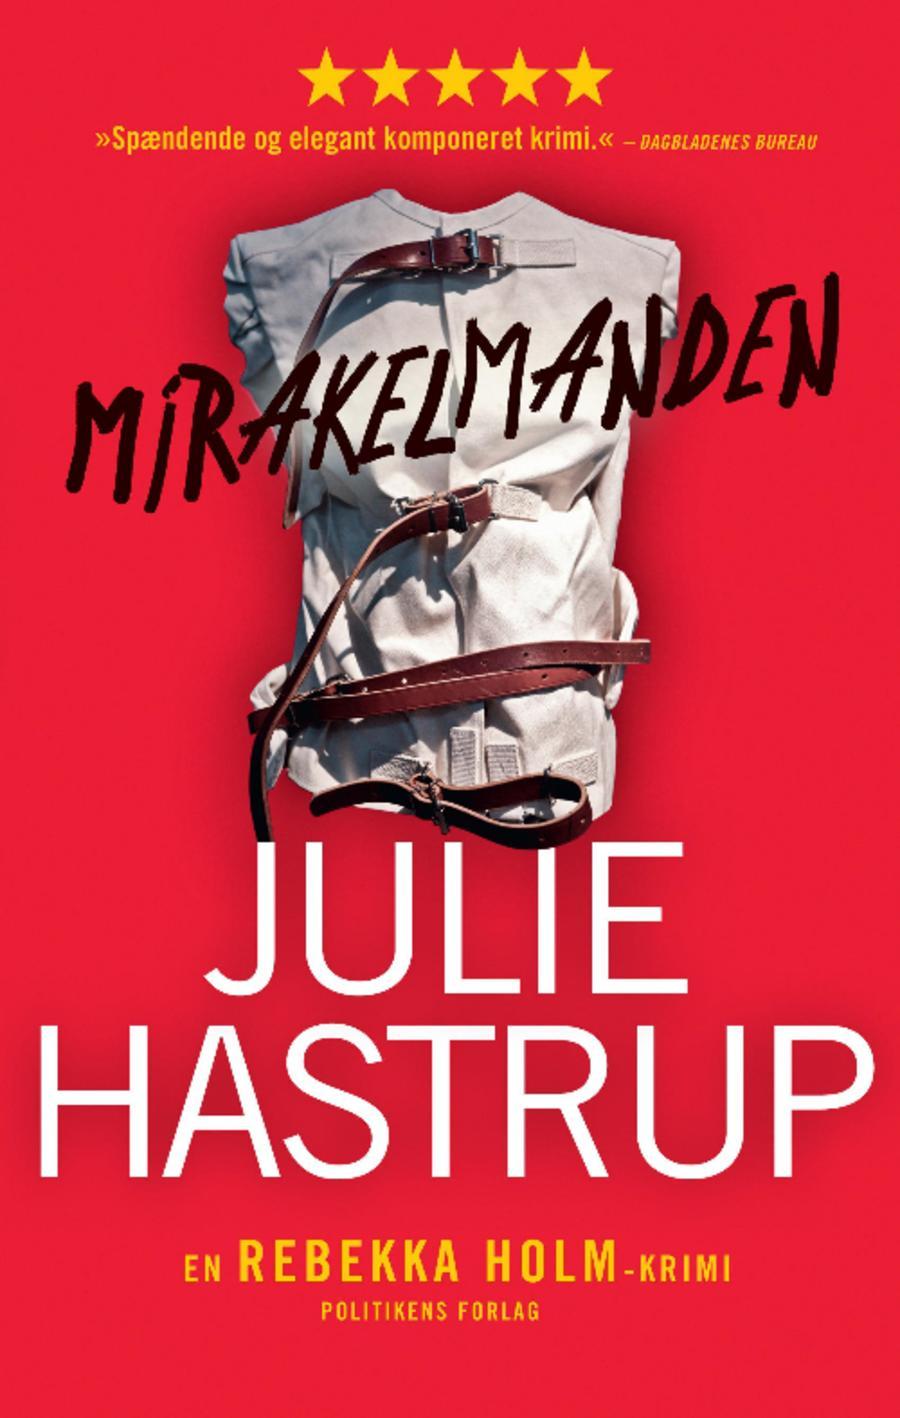 Mirakelmanden af Julie Hastrup